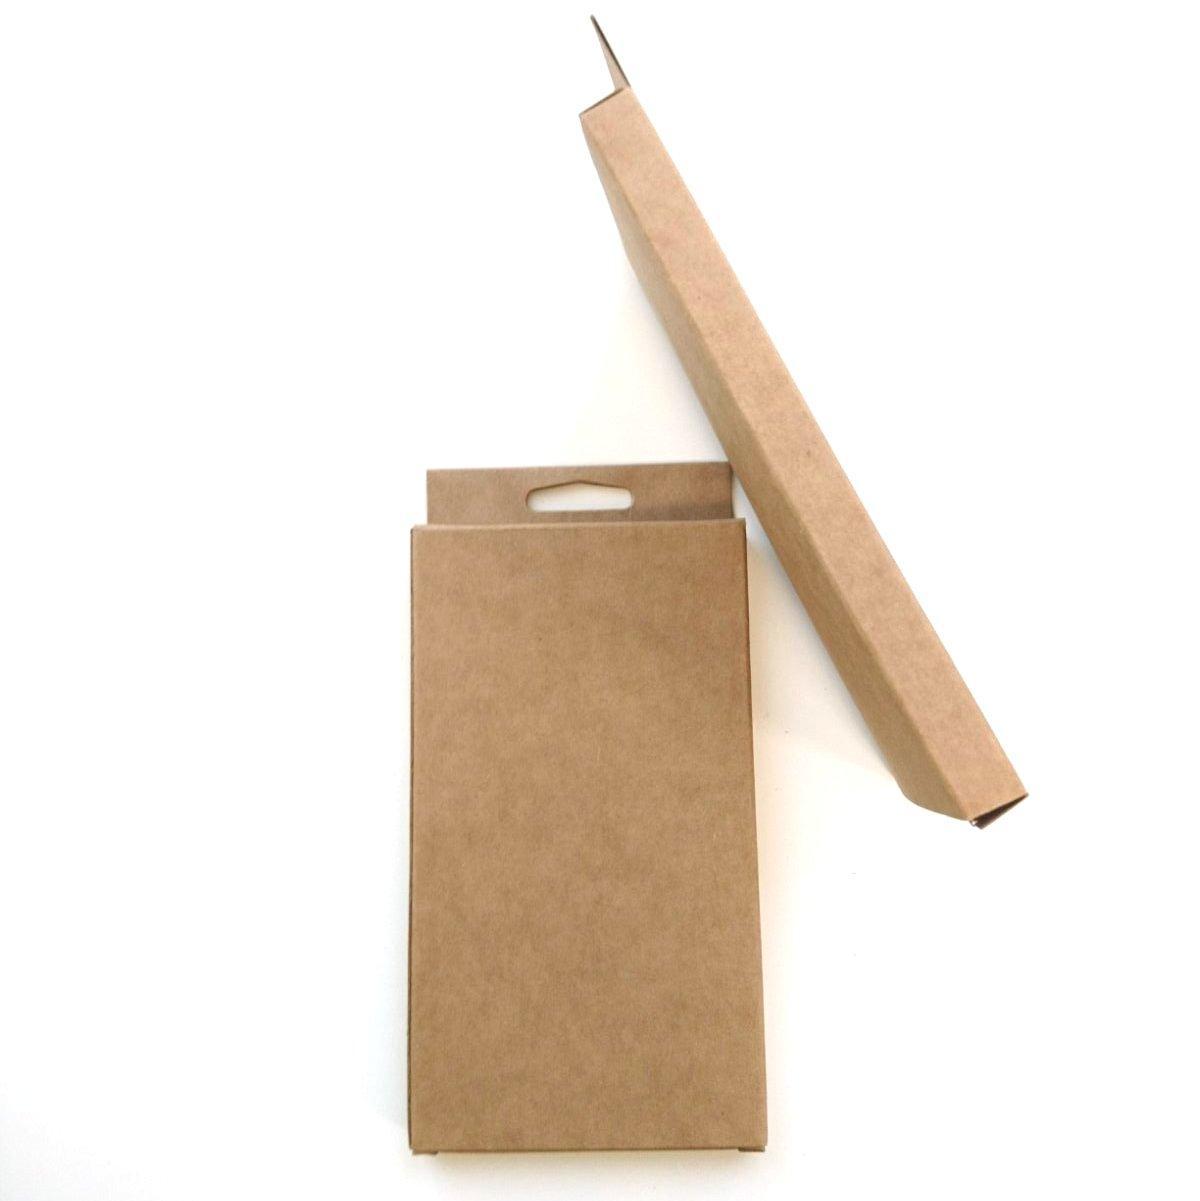 Коробка, упаковка 90х160х12 мм с европодвесом из крафт картона 275 гр/кв.м